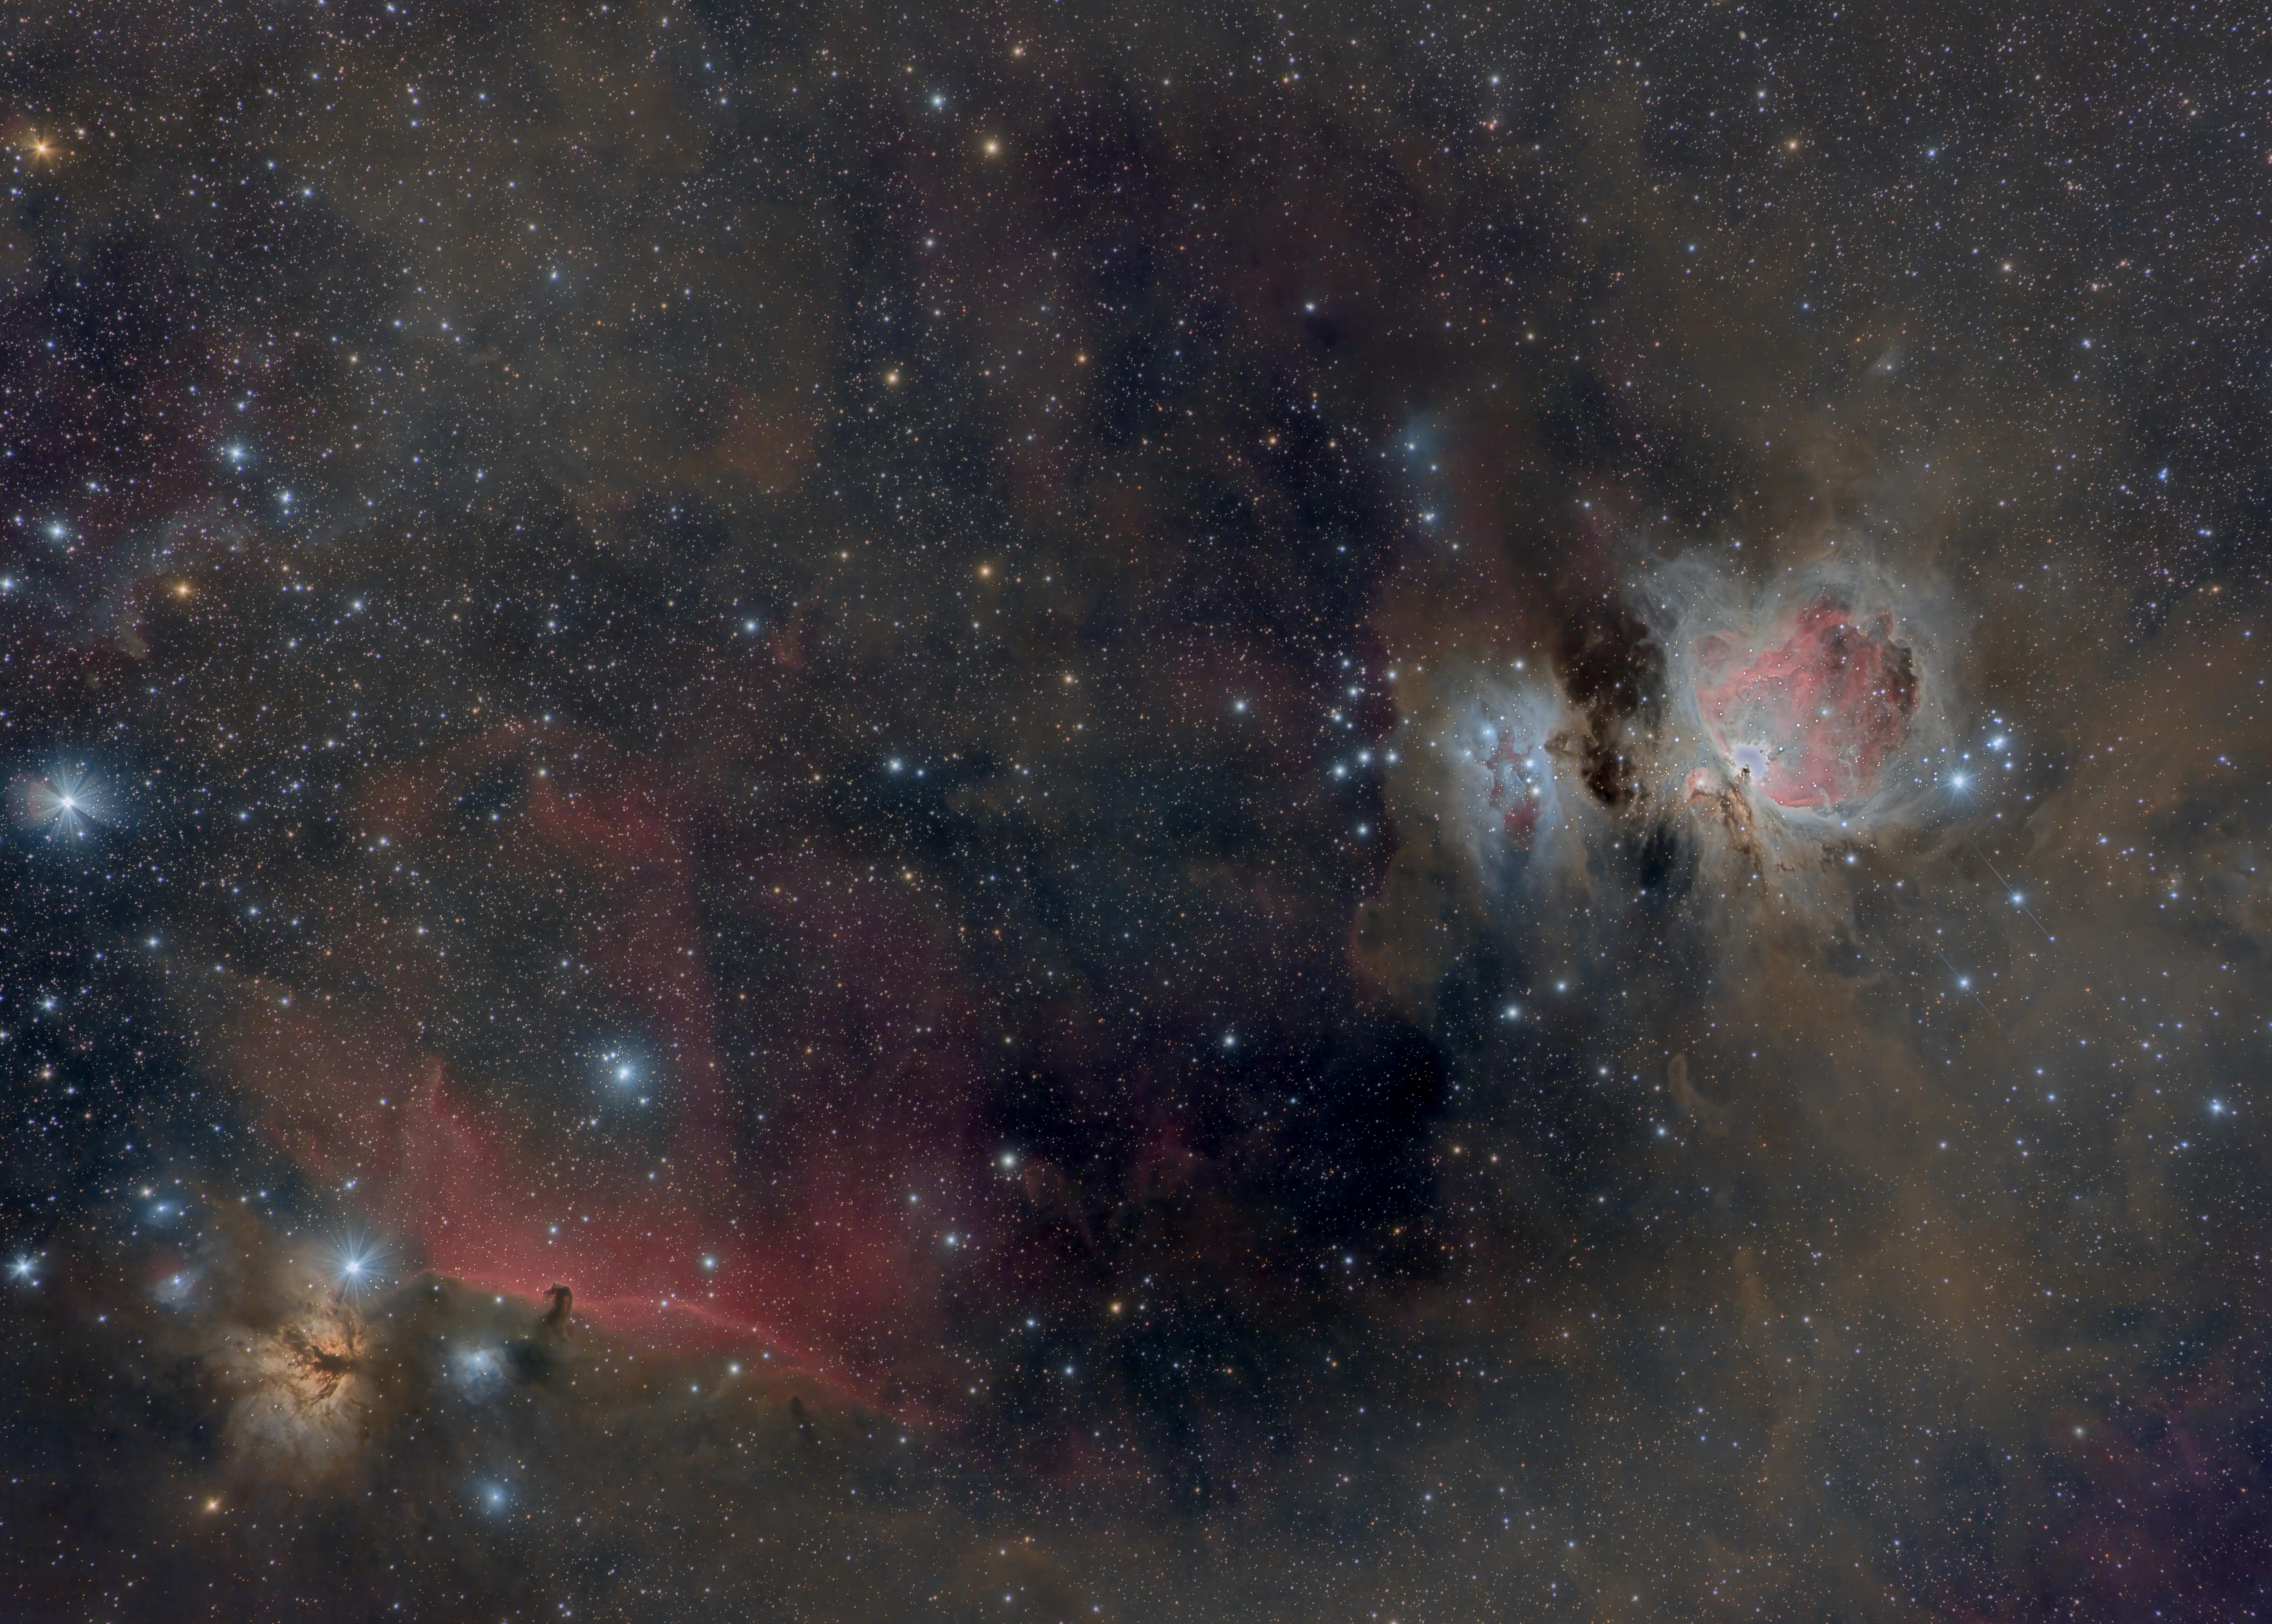 M42_IC434_LF_Nebel_cut